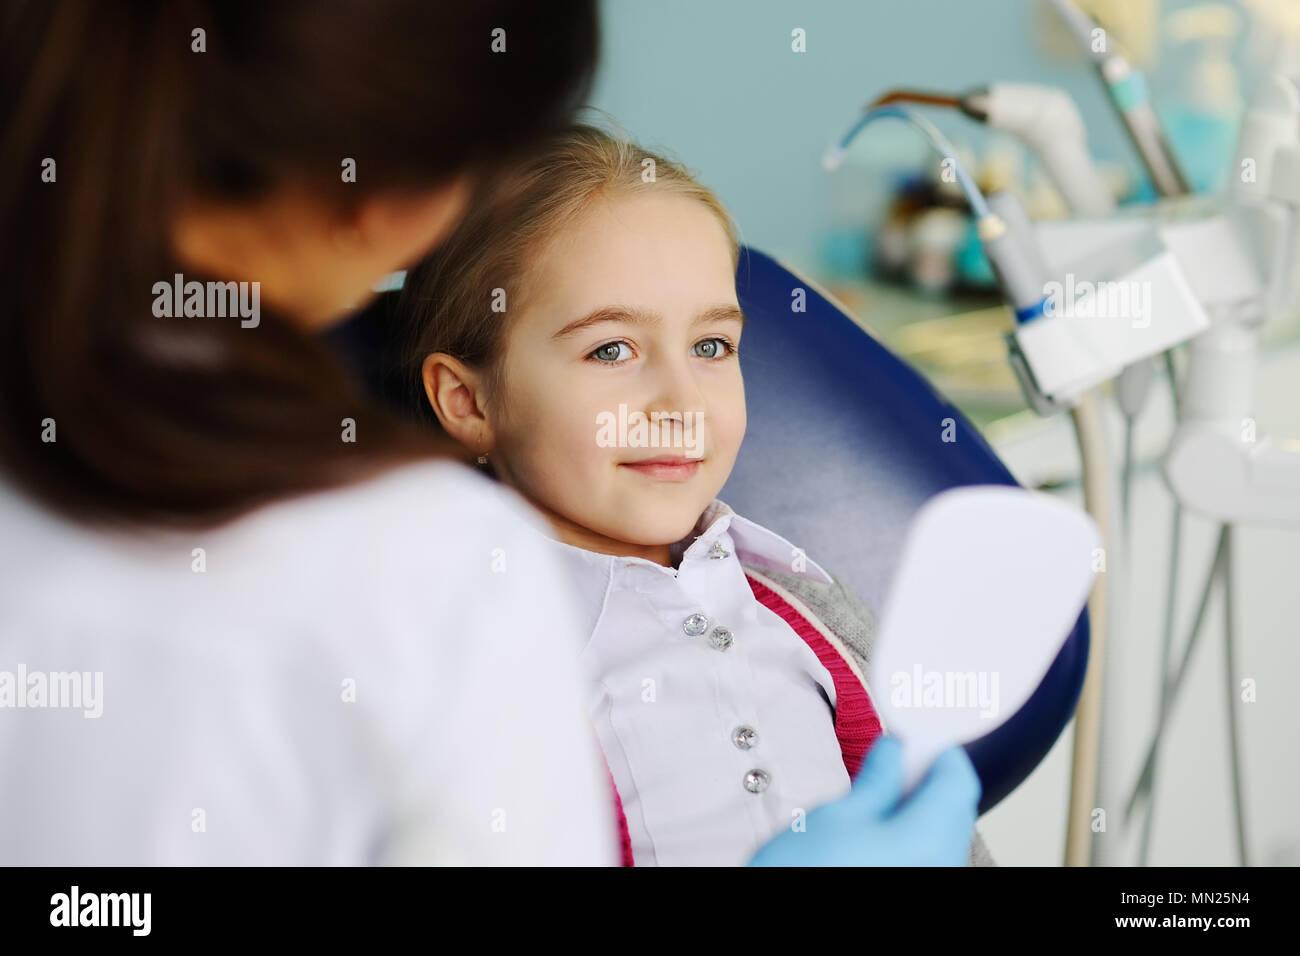 girl examines teeth in a dental mirror Stock Photo